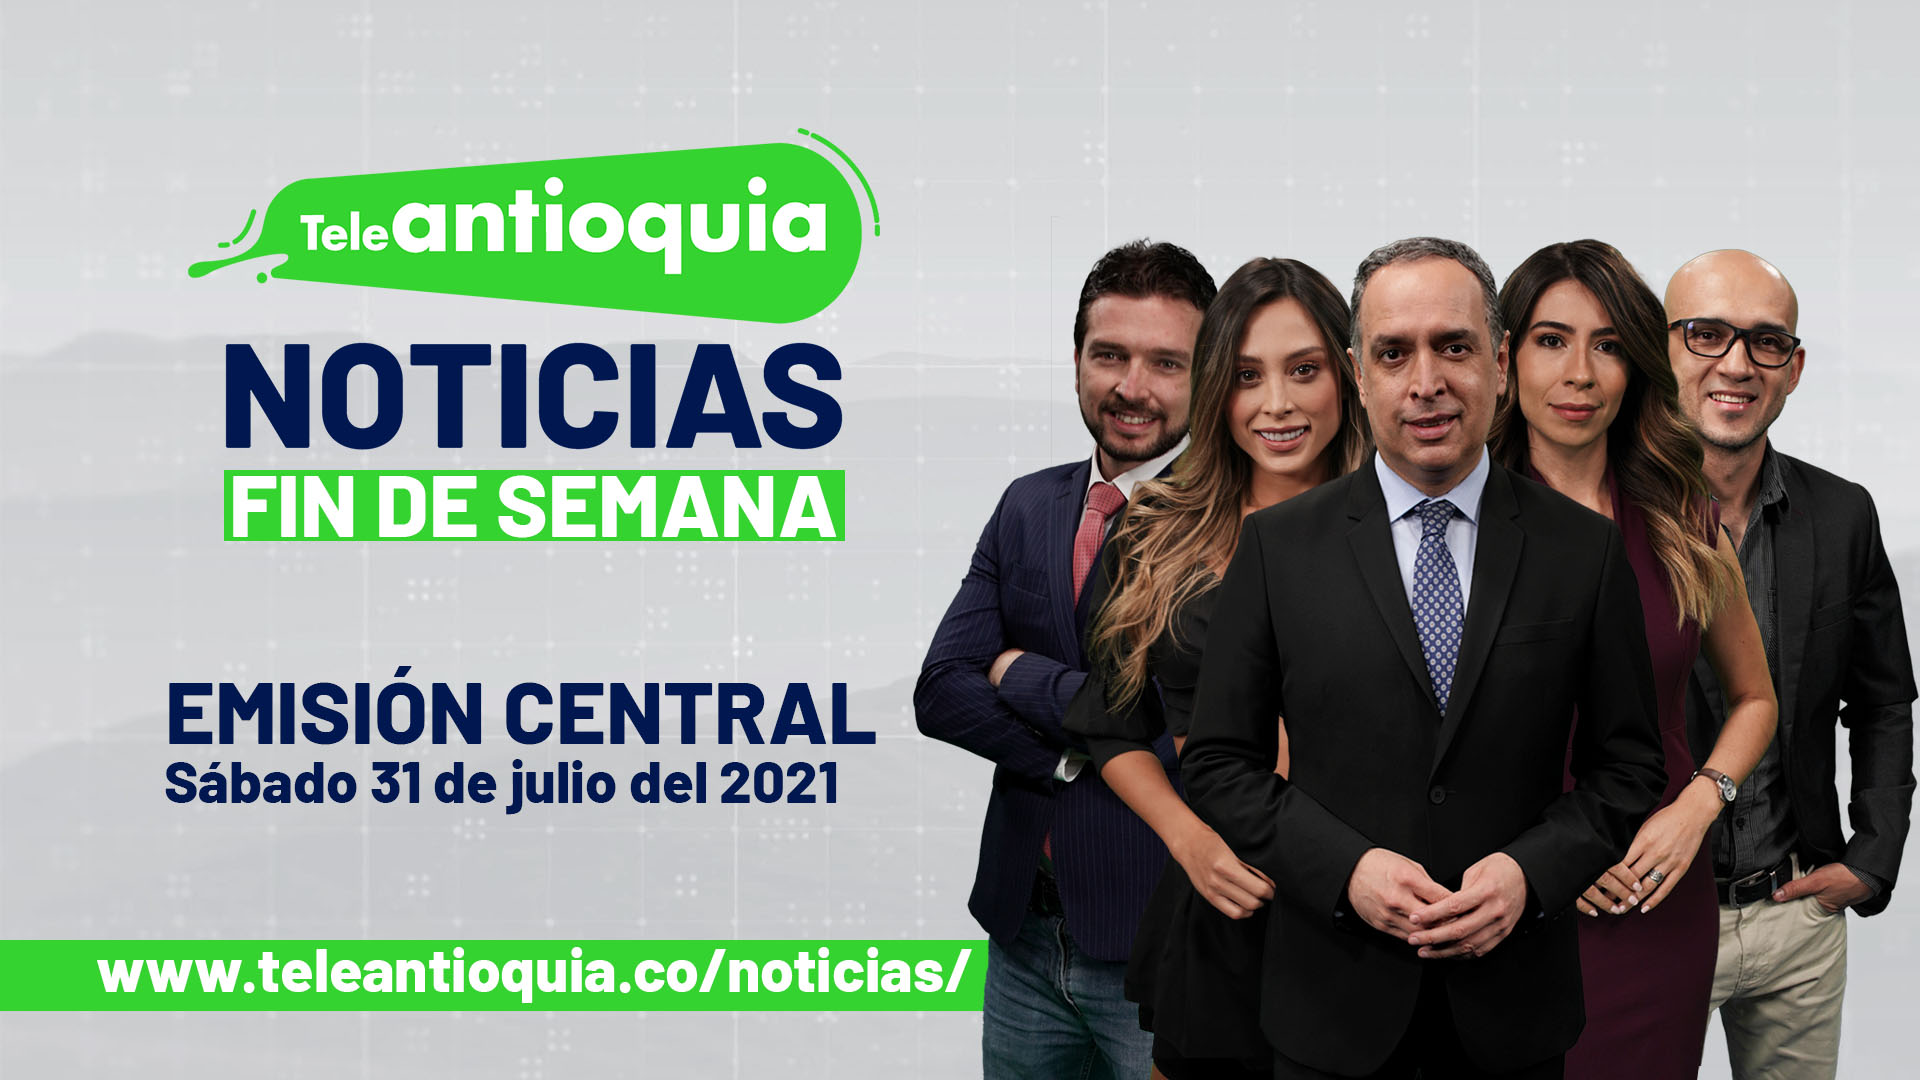 Teleantioquia Noticias – sábado 31 de julio de 2021 noche